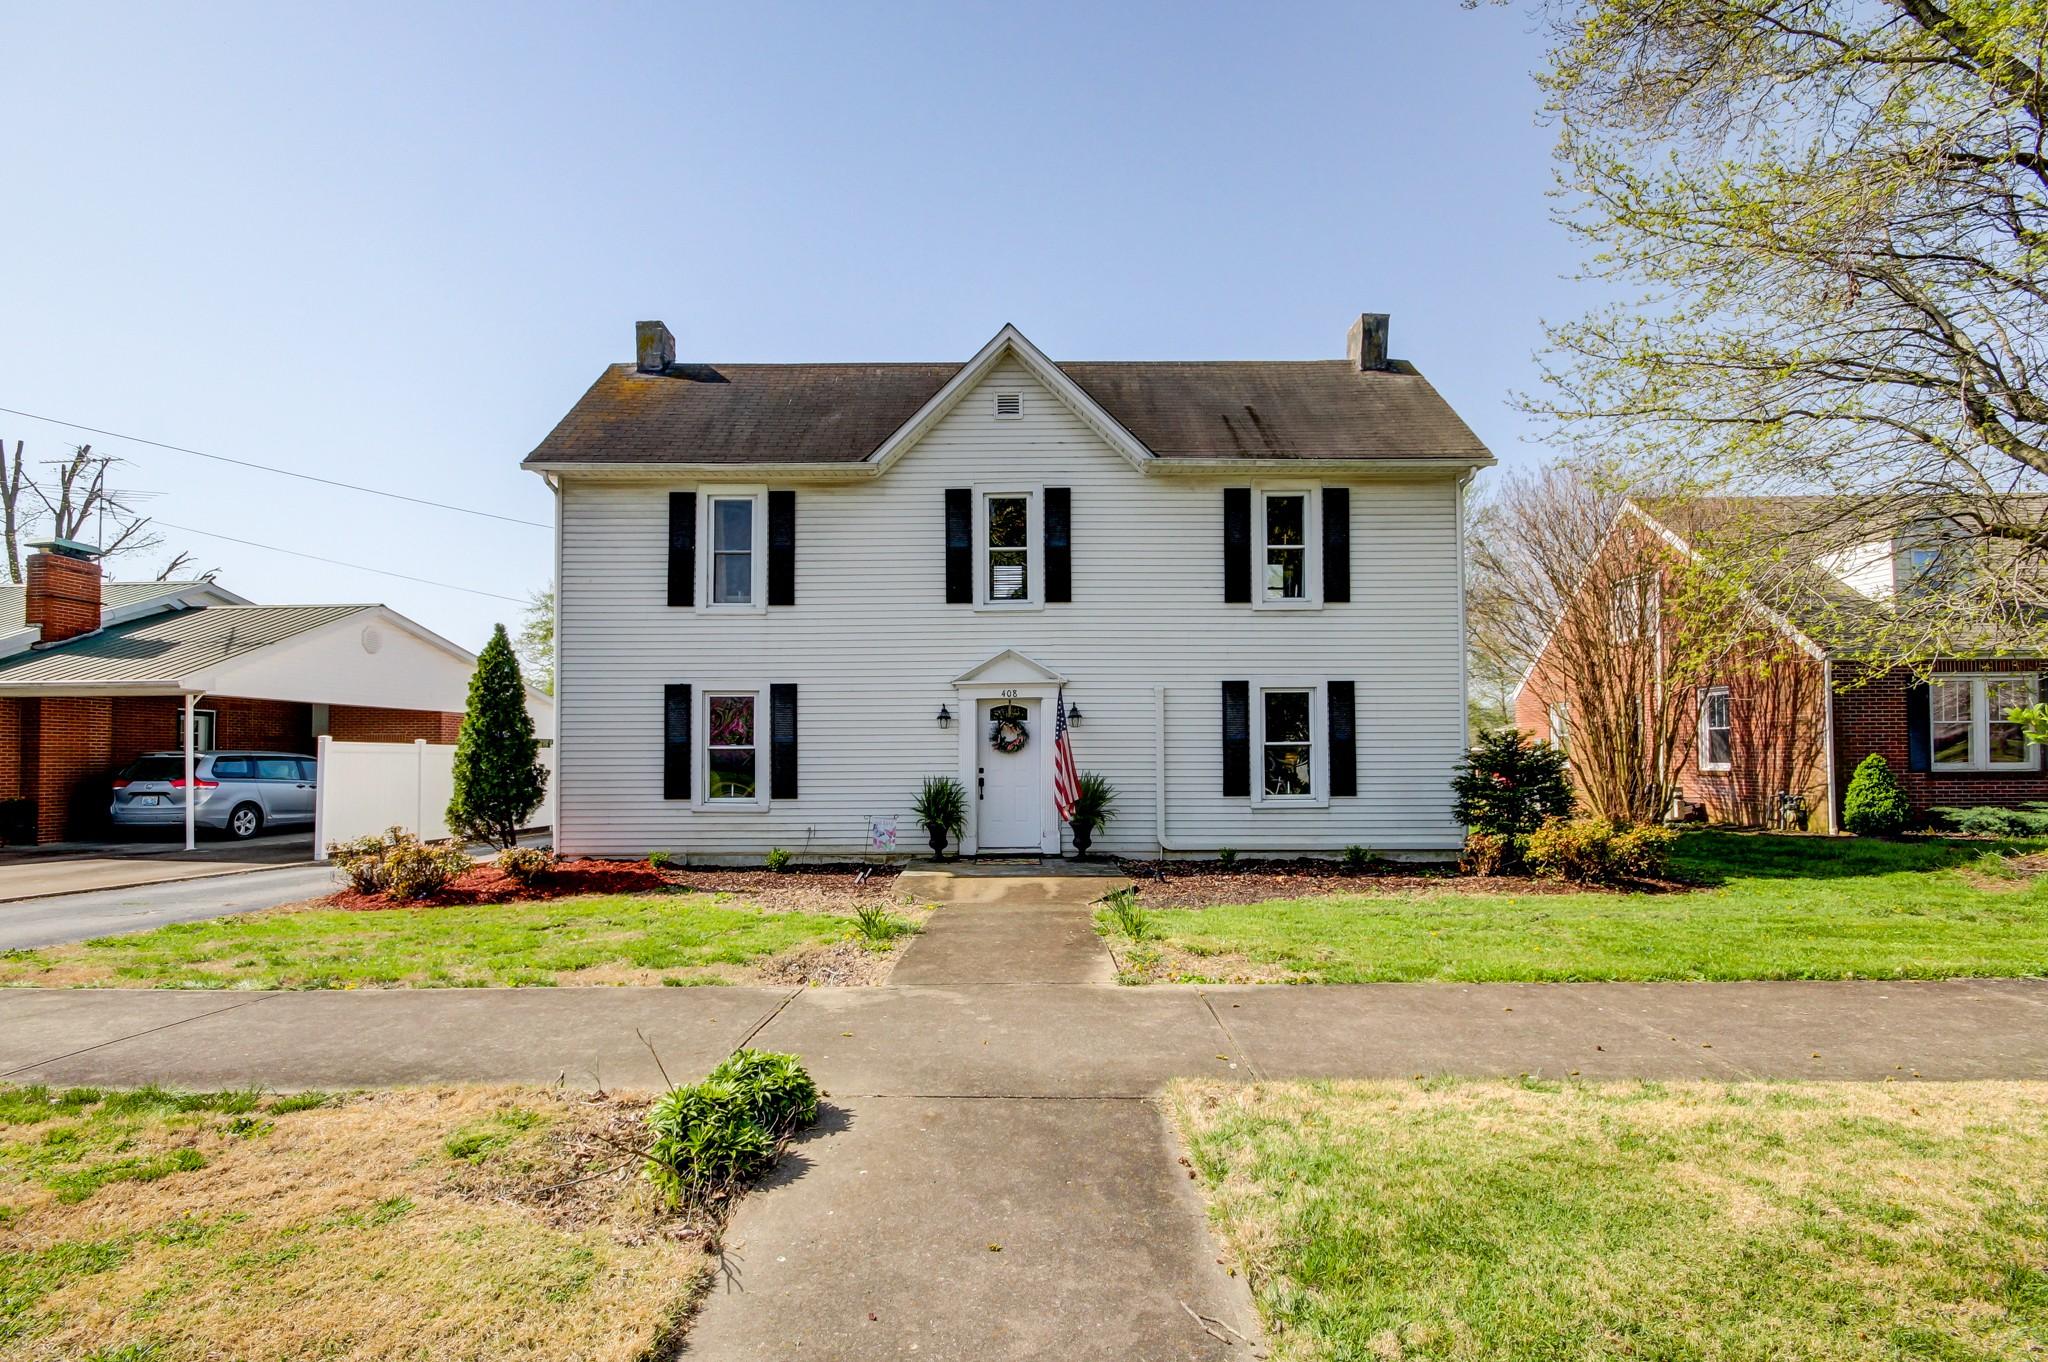 408 E Main St Property Photo - Elkton, KY real estate listing